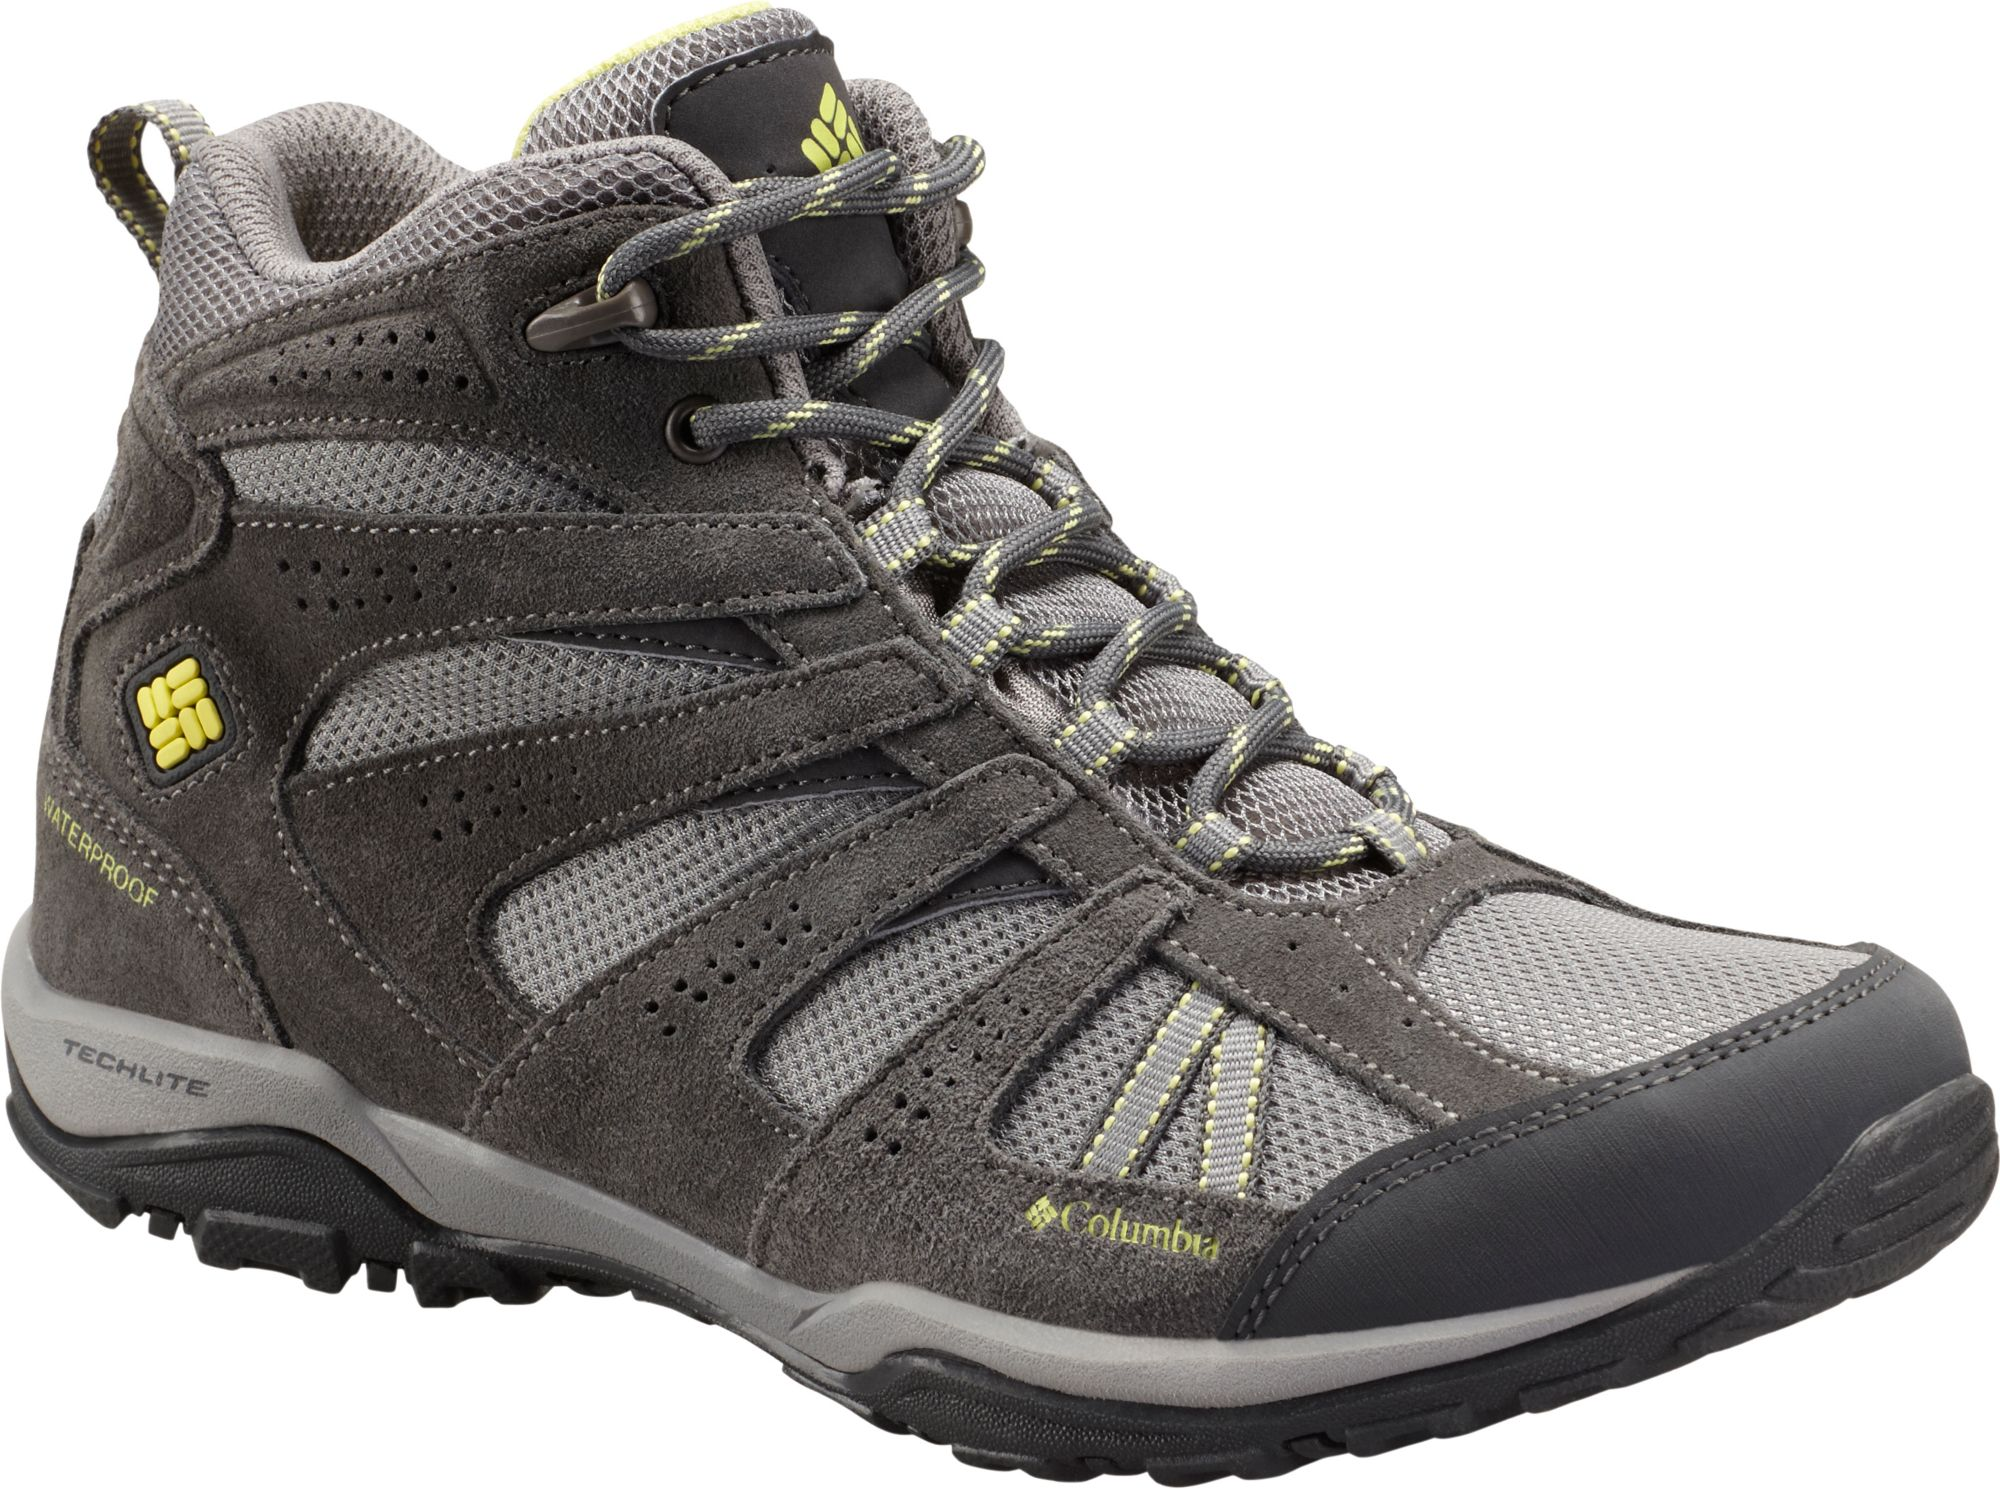 Columbia Women's Dakota Drifter Mid Waterproof Hiking Boots ...